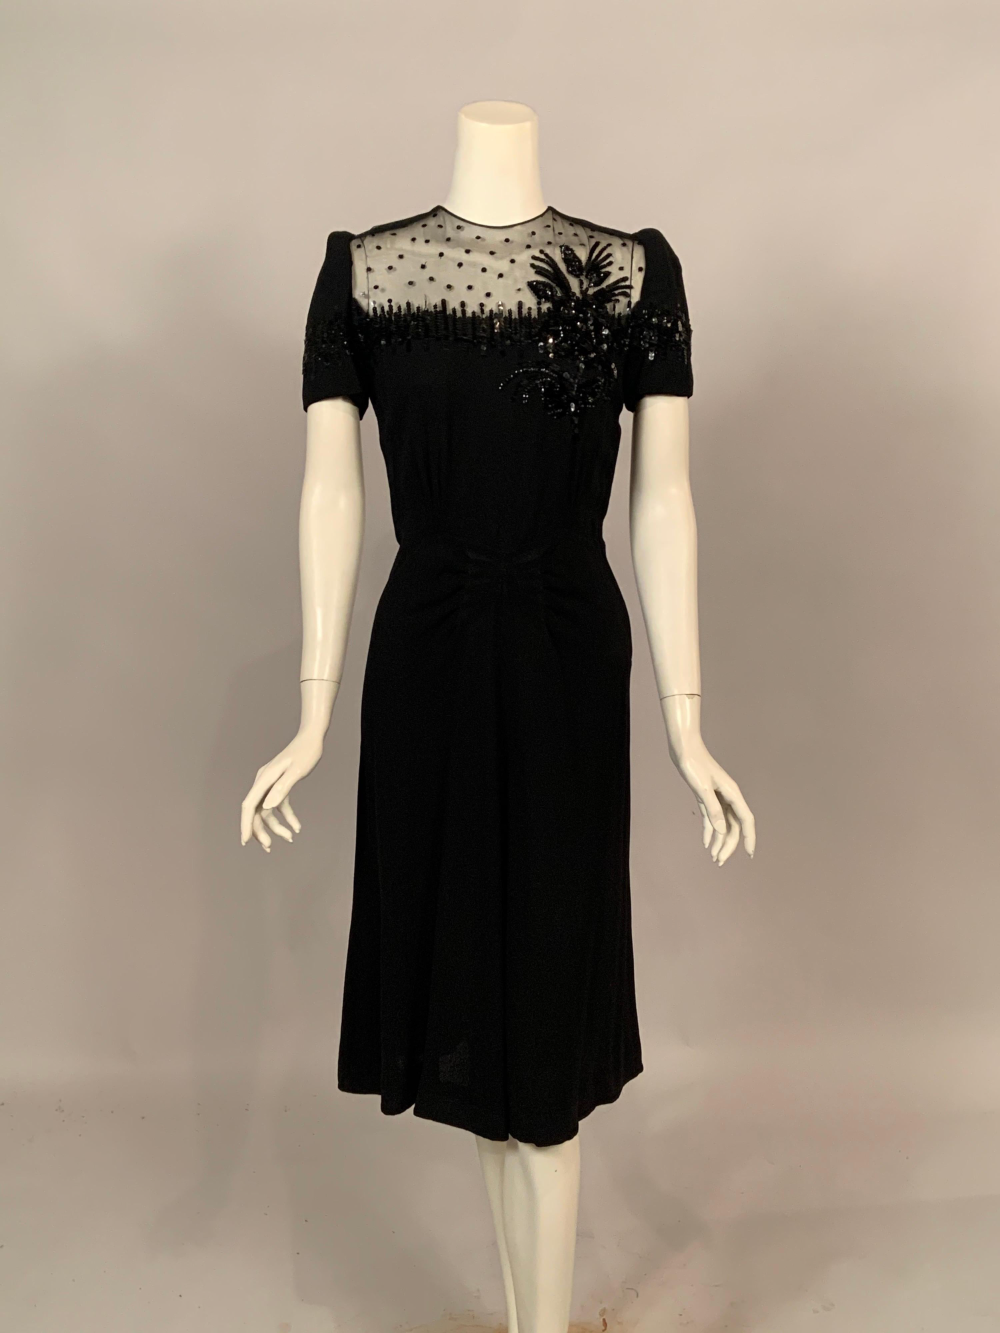 1940 S Black Crepe Dress Elaborately Beaded Sheer Top Dresses Crepe Dress Chiffon Cocktail Dress [ 1333 x 1000 Pixel ]